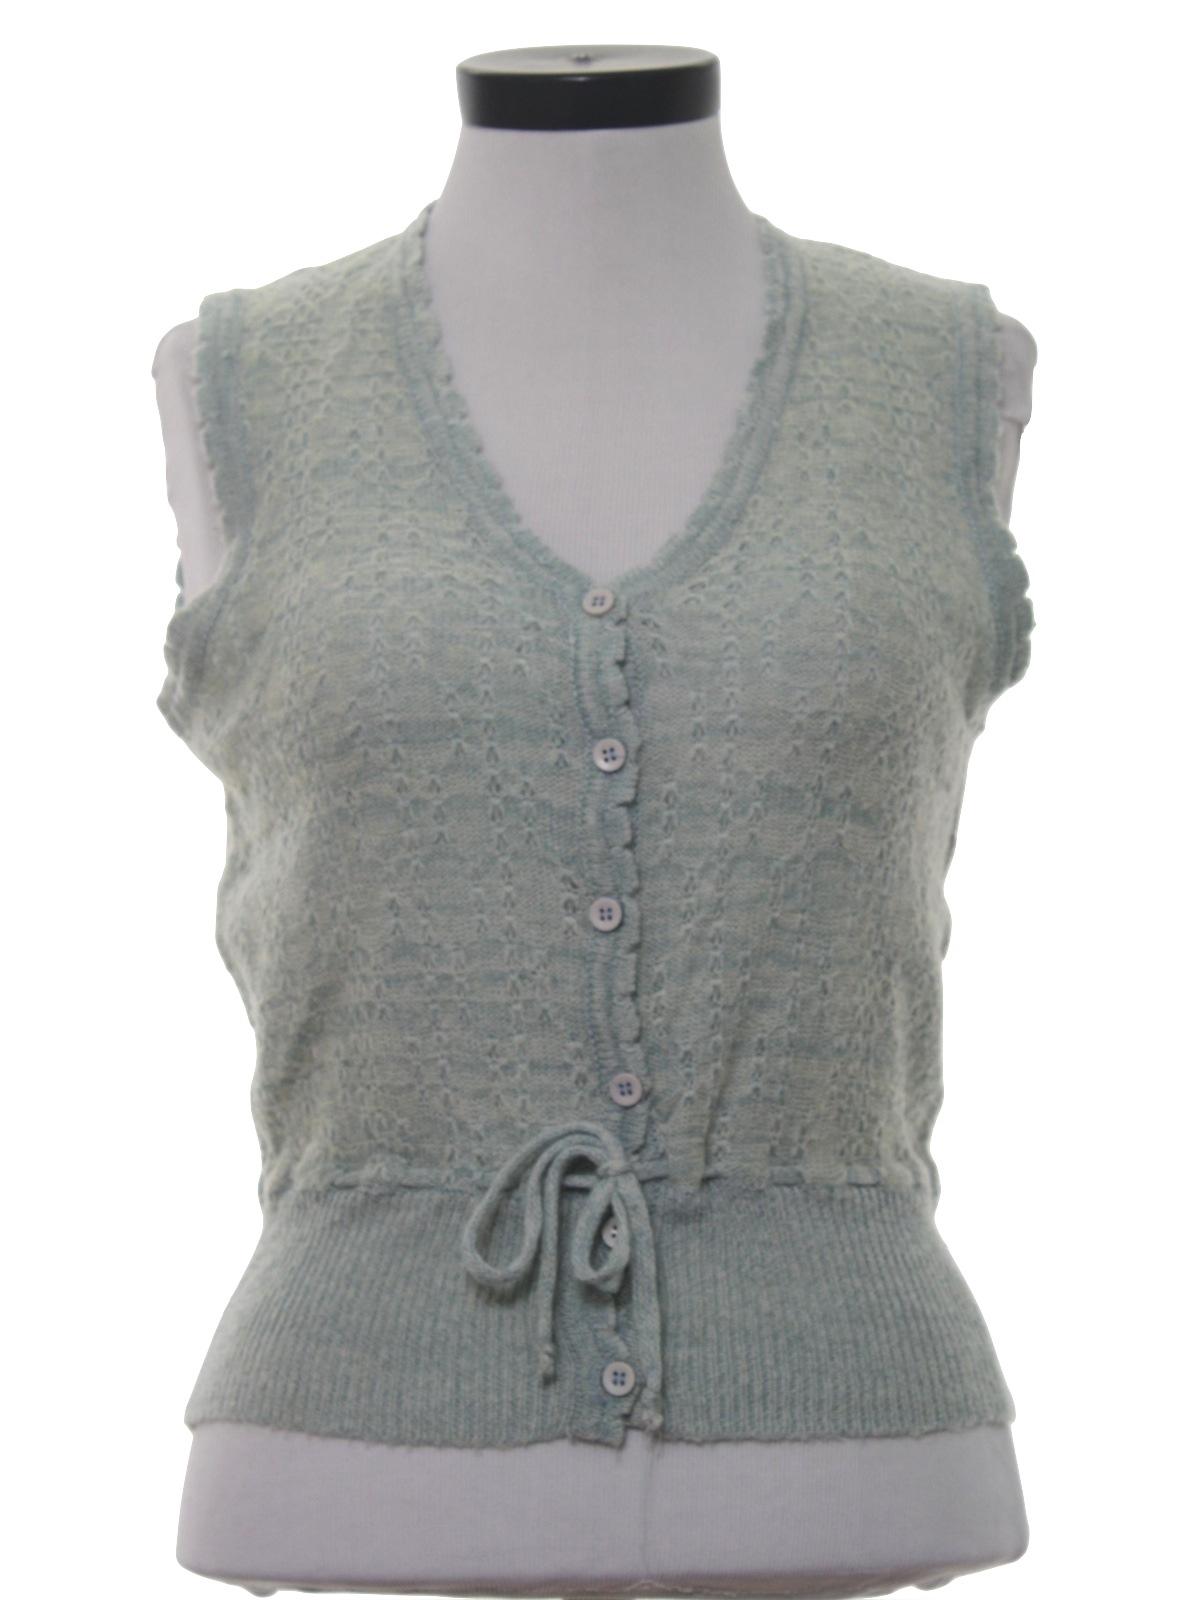 80's Monarch Knits Sweater: 80s -Monarch Knits- Womens hazy aqua ...